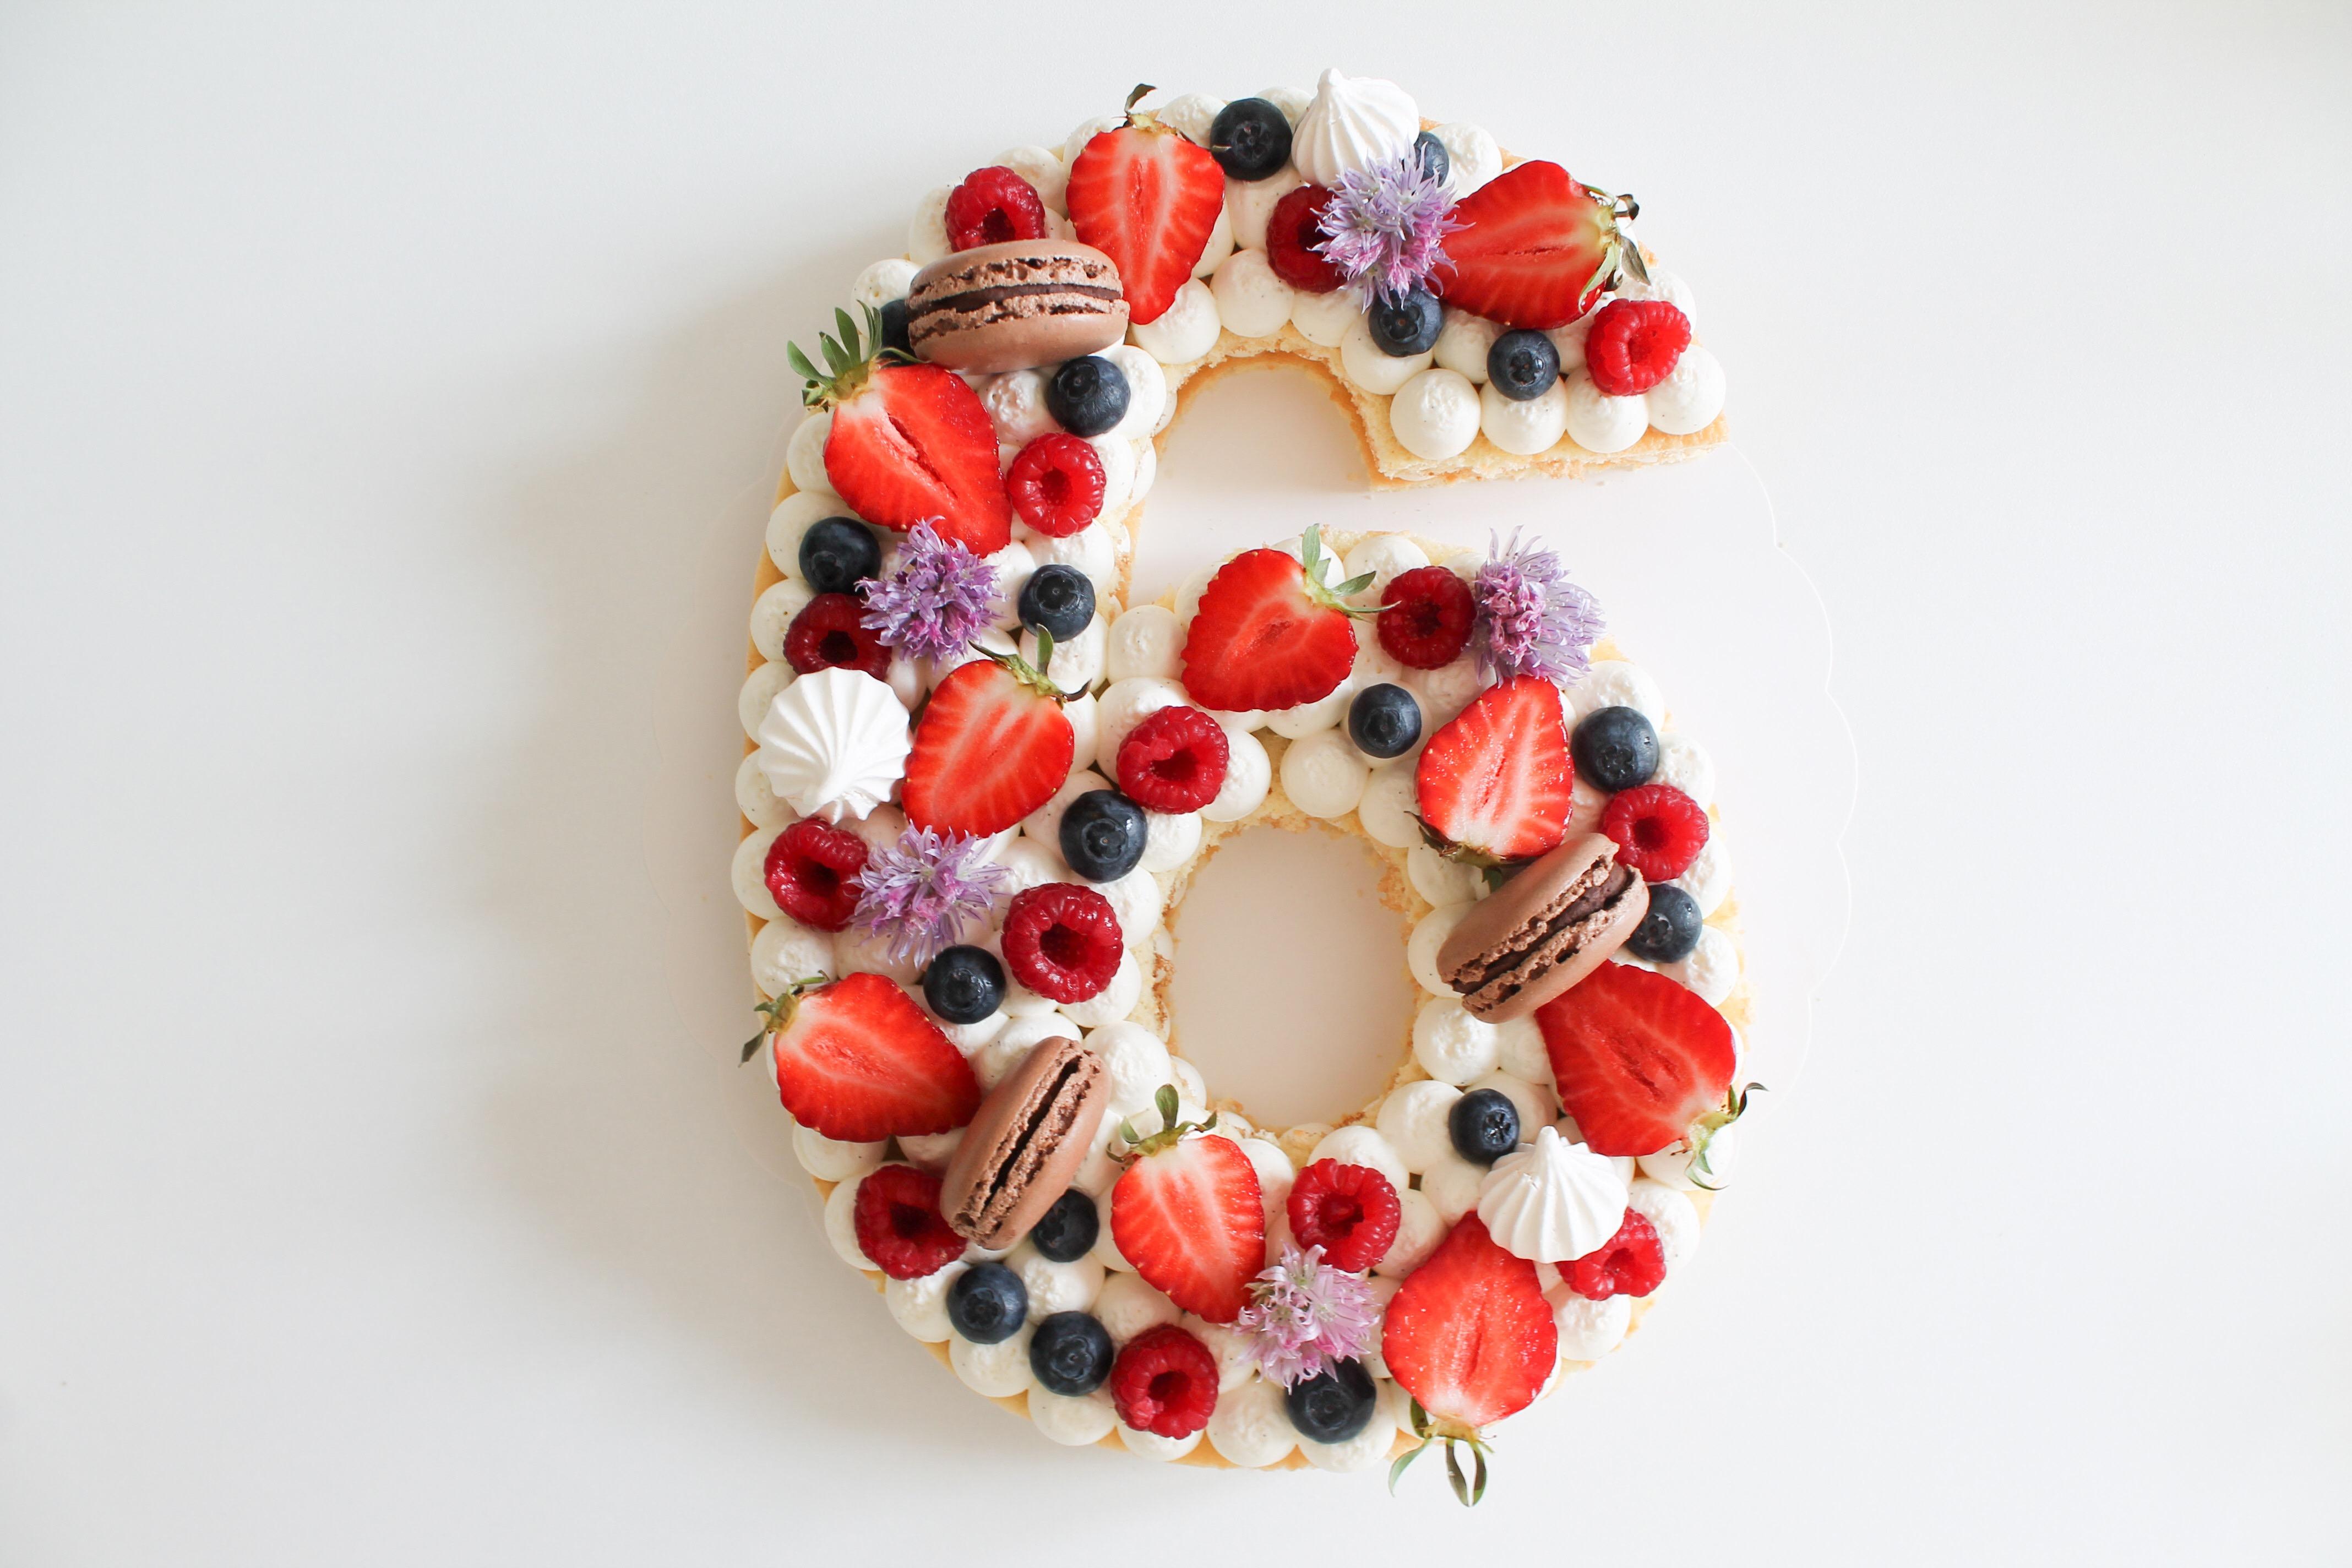 NUMBER CAKE VANILLE ET FRUITS ROUGES